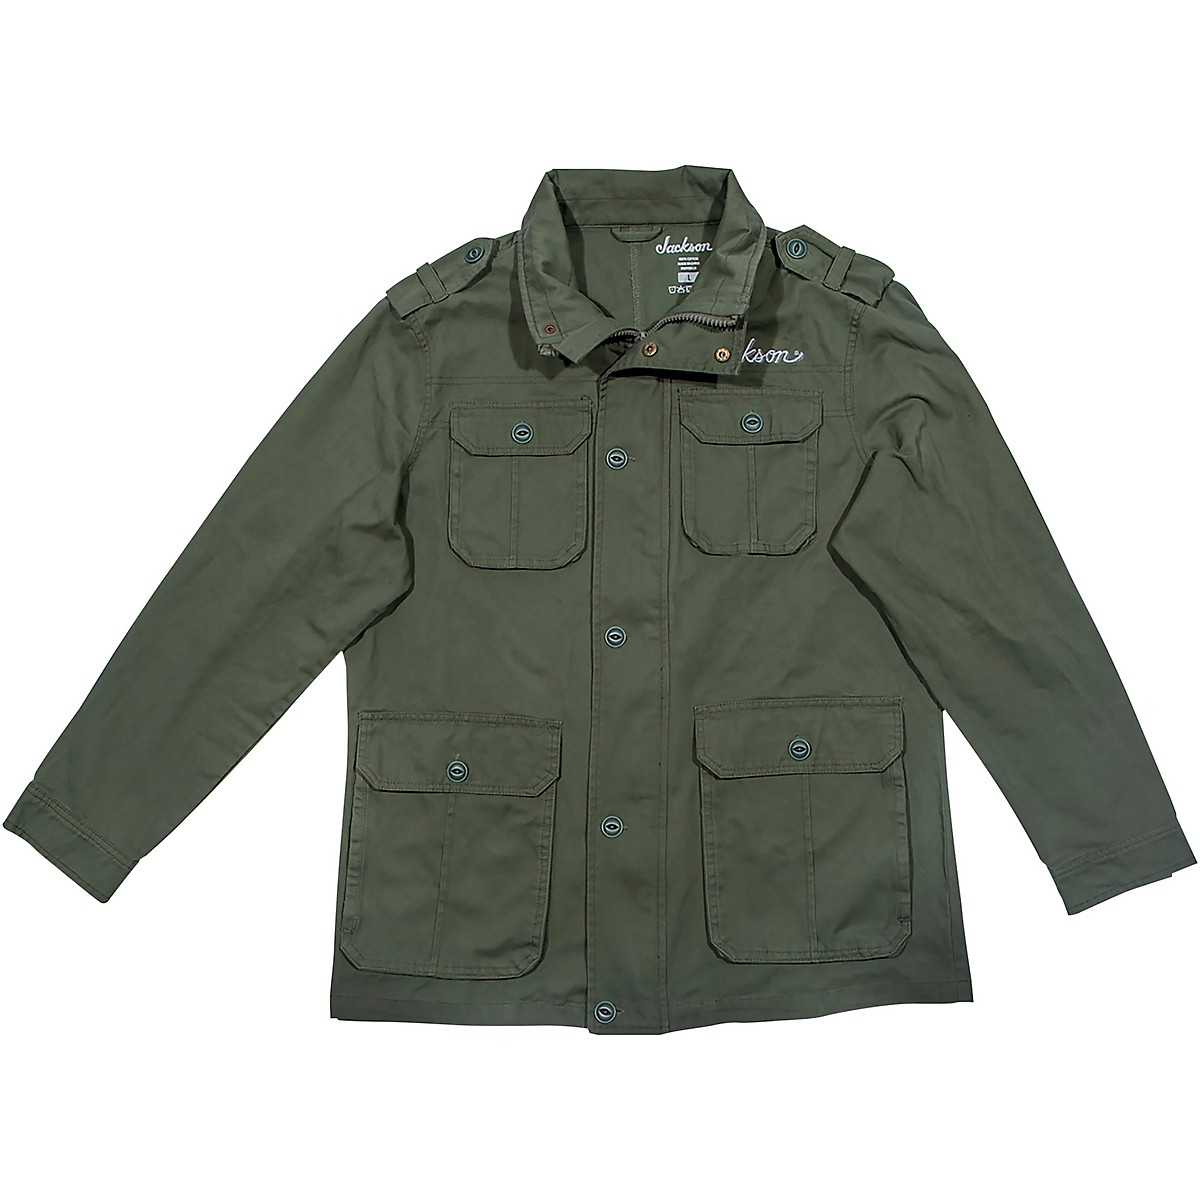 Jackson Army Jacket - Green